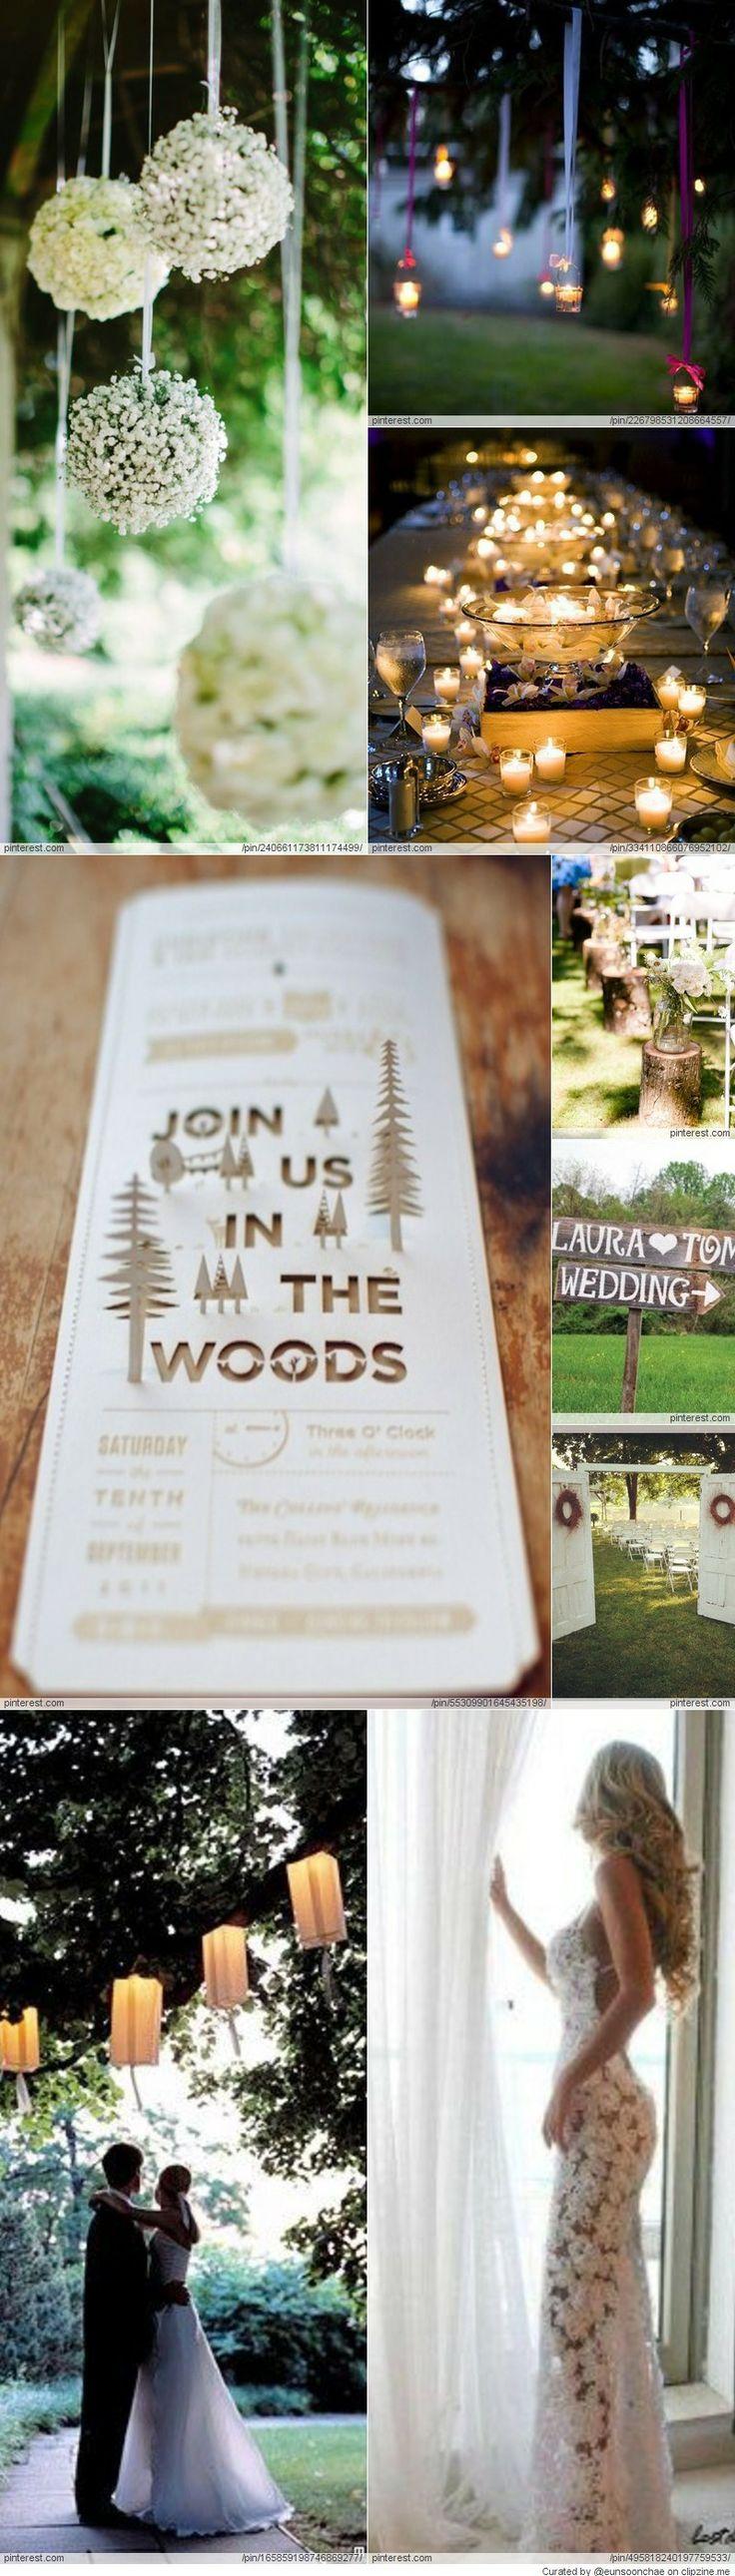 For Outdoor Weddings